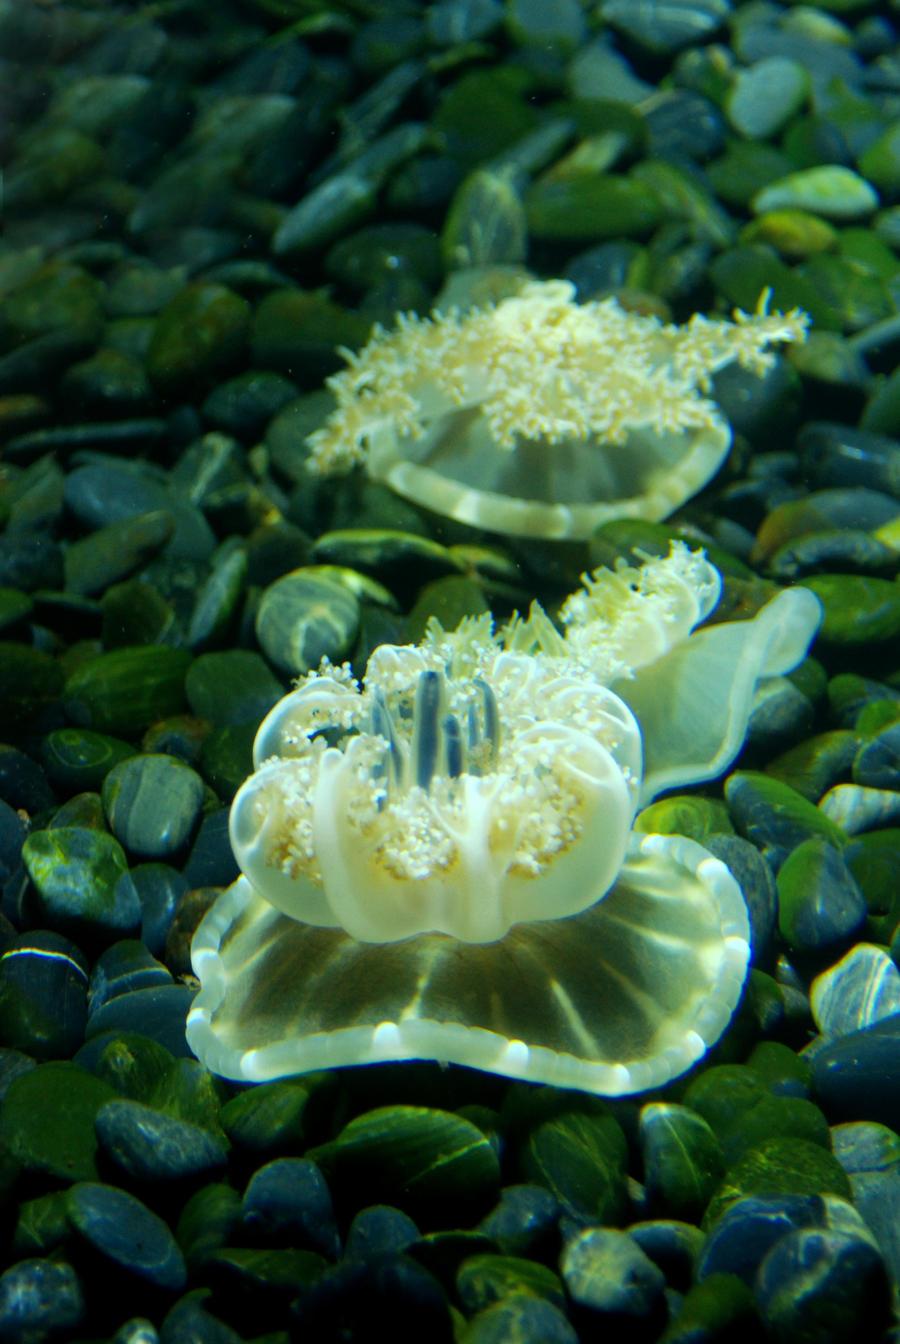 Upside Down Jellyfish by labyrinth56